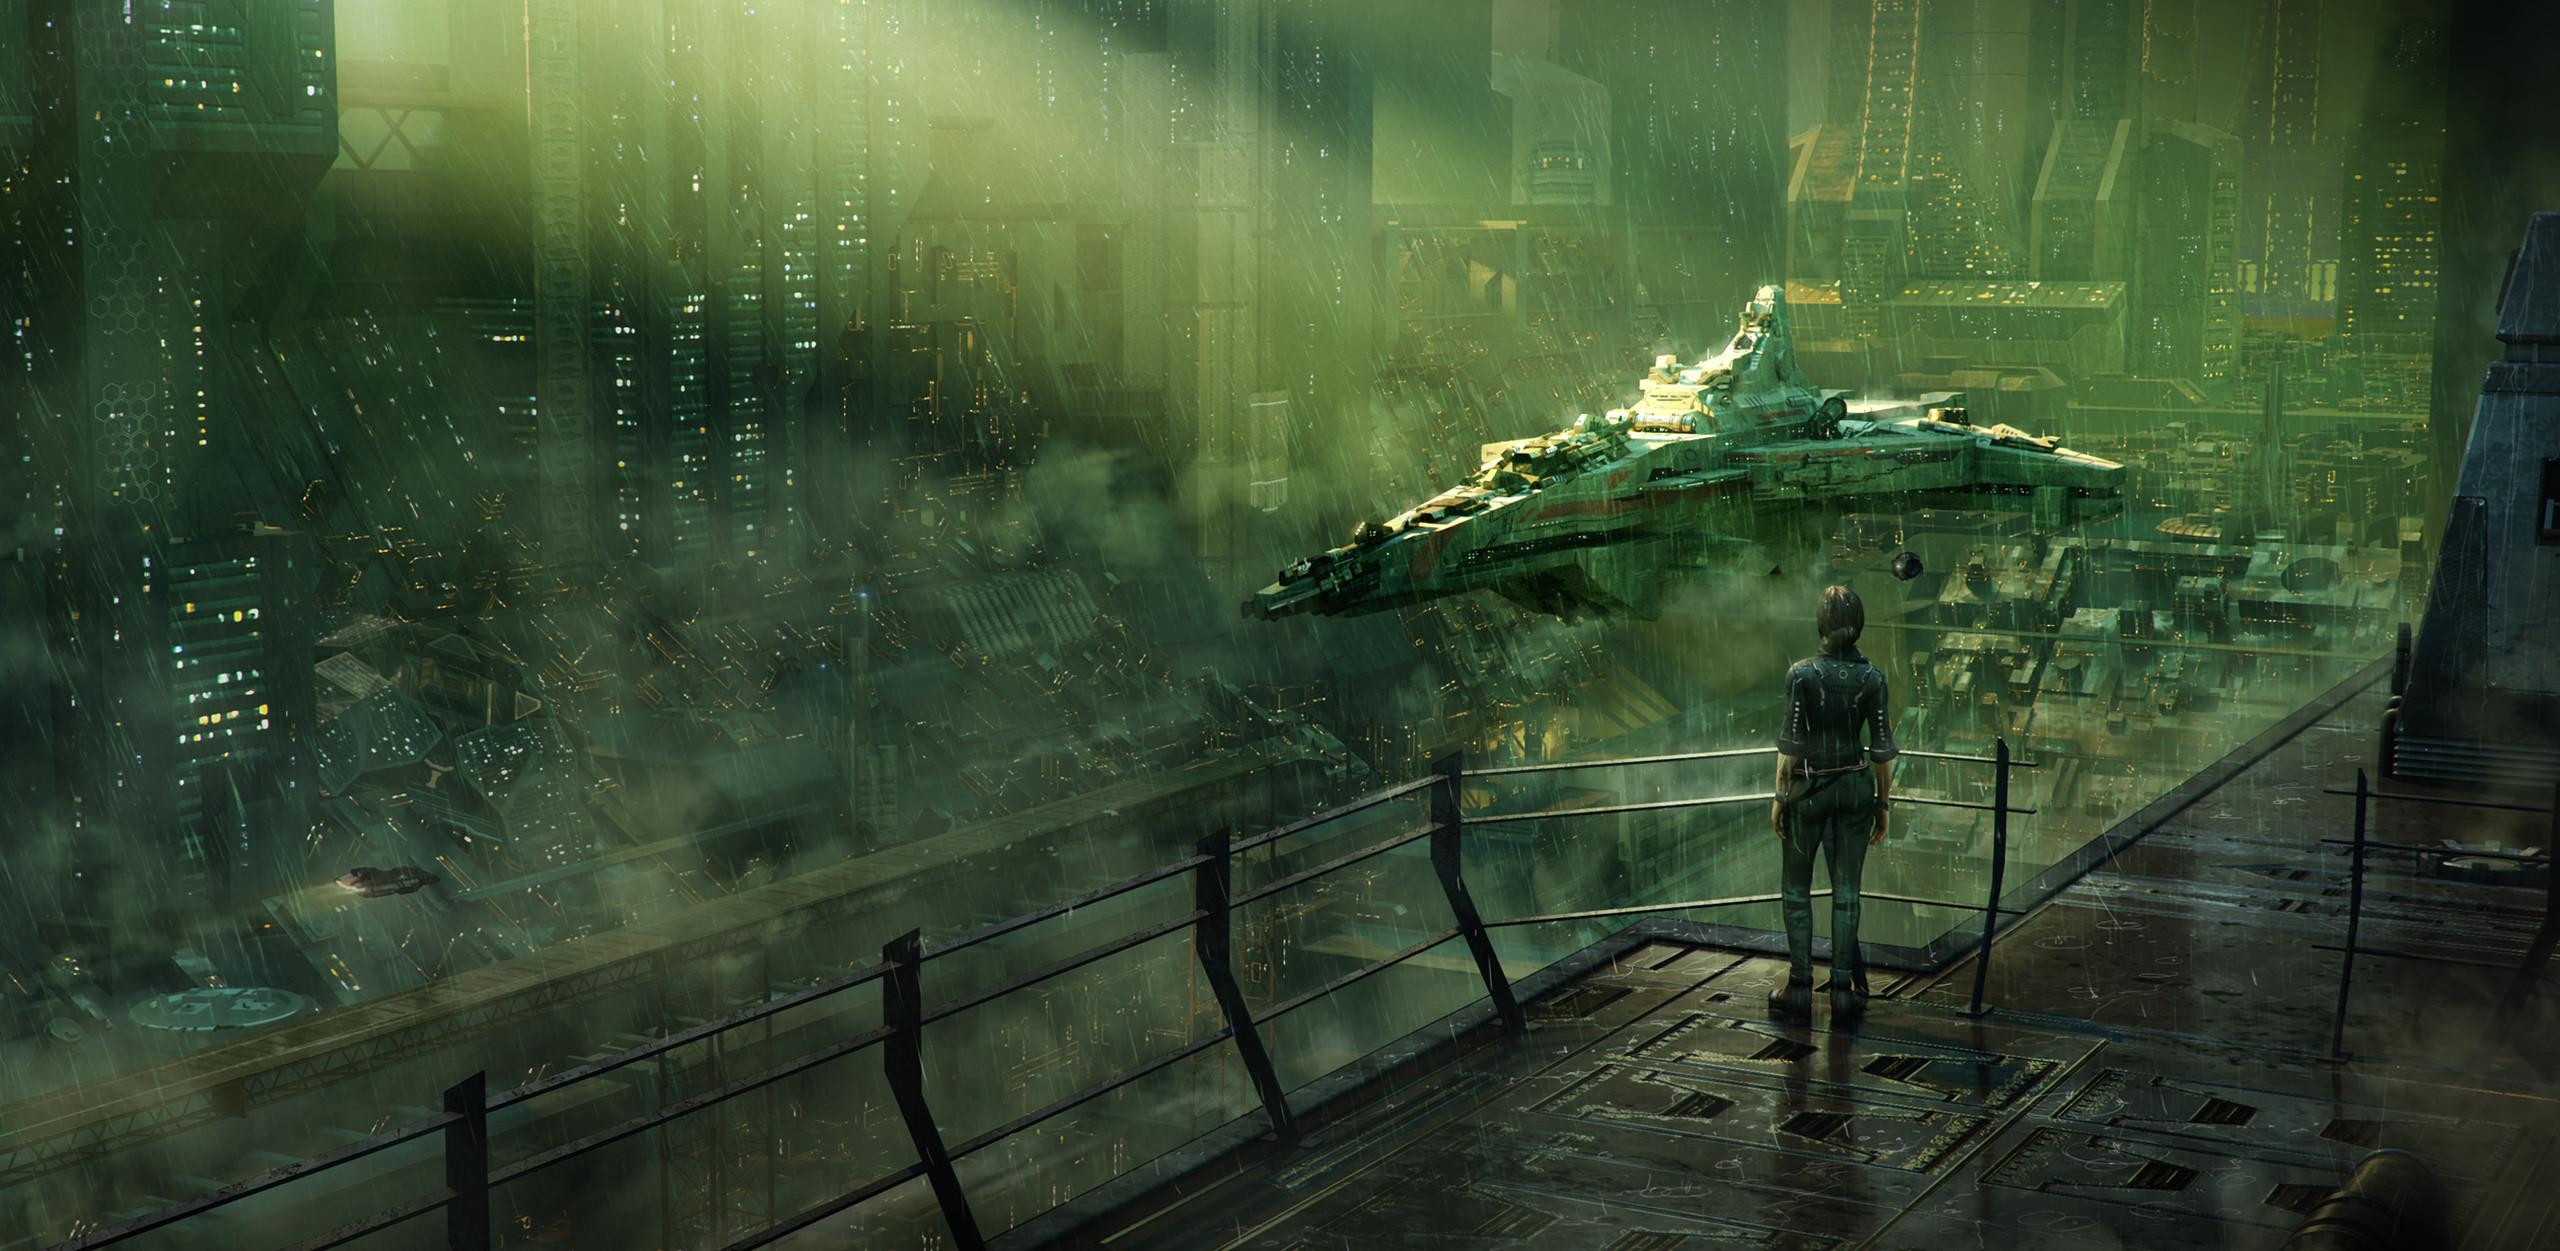 General 2560x1251 futuristic artwork ship digital science fiction futuristic city